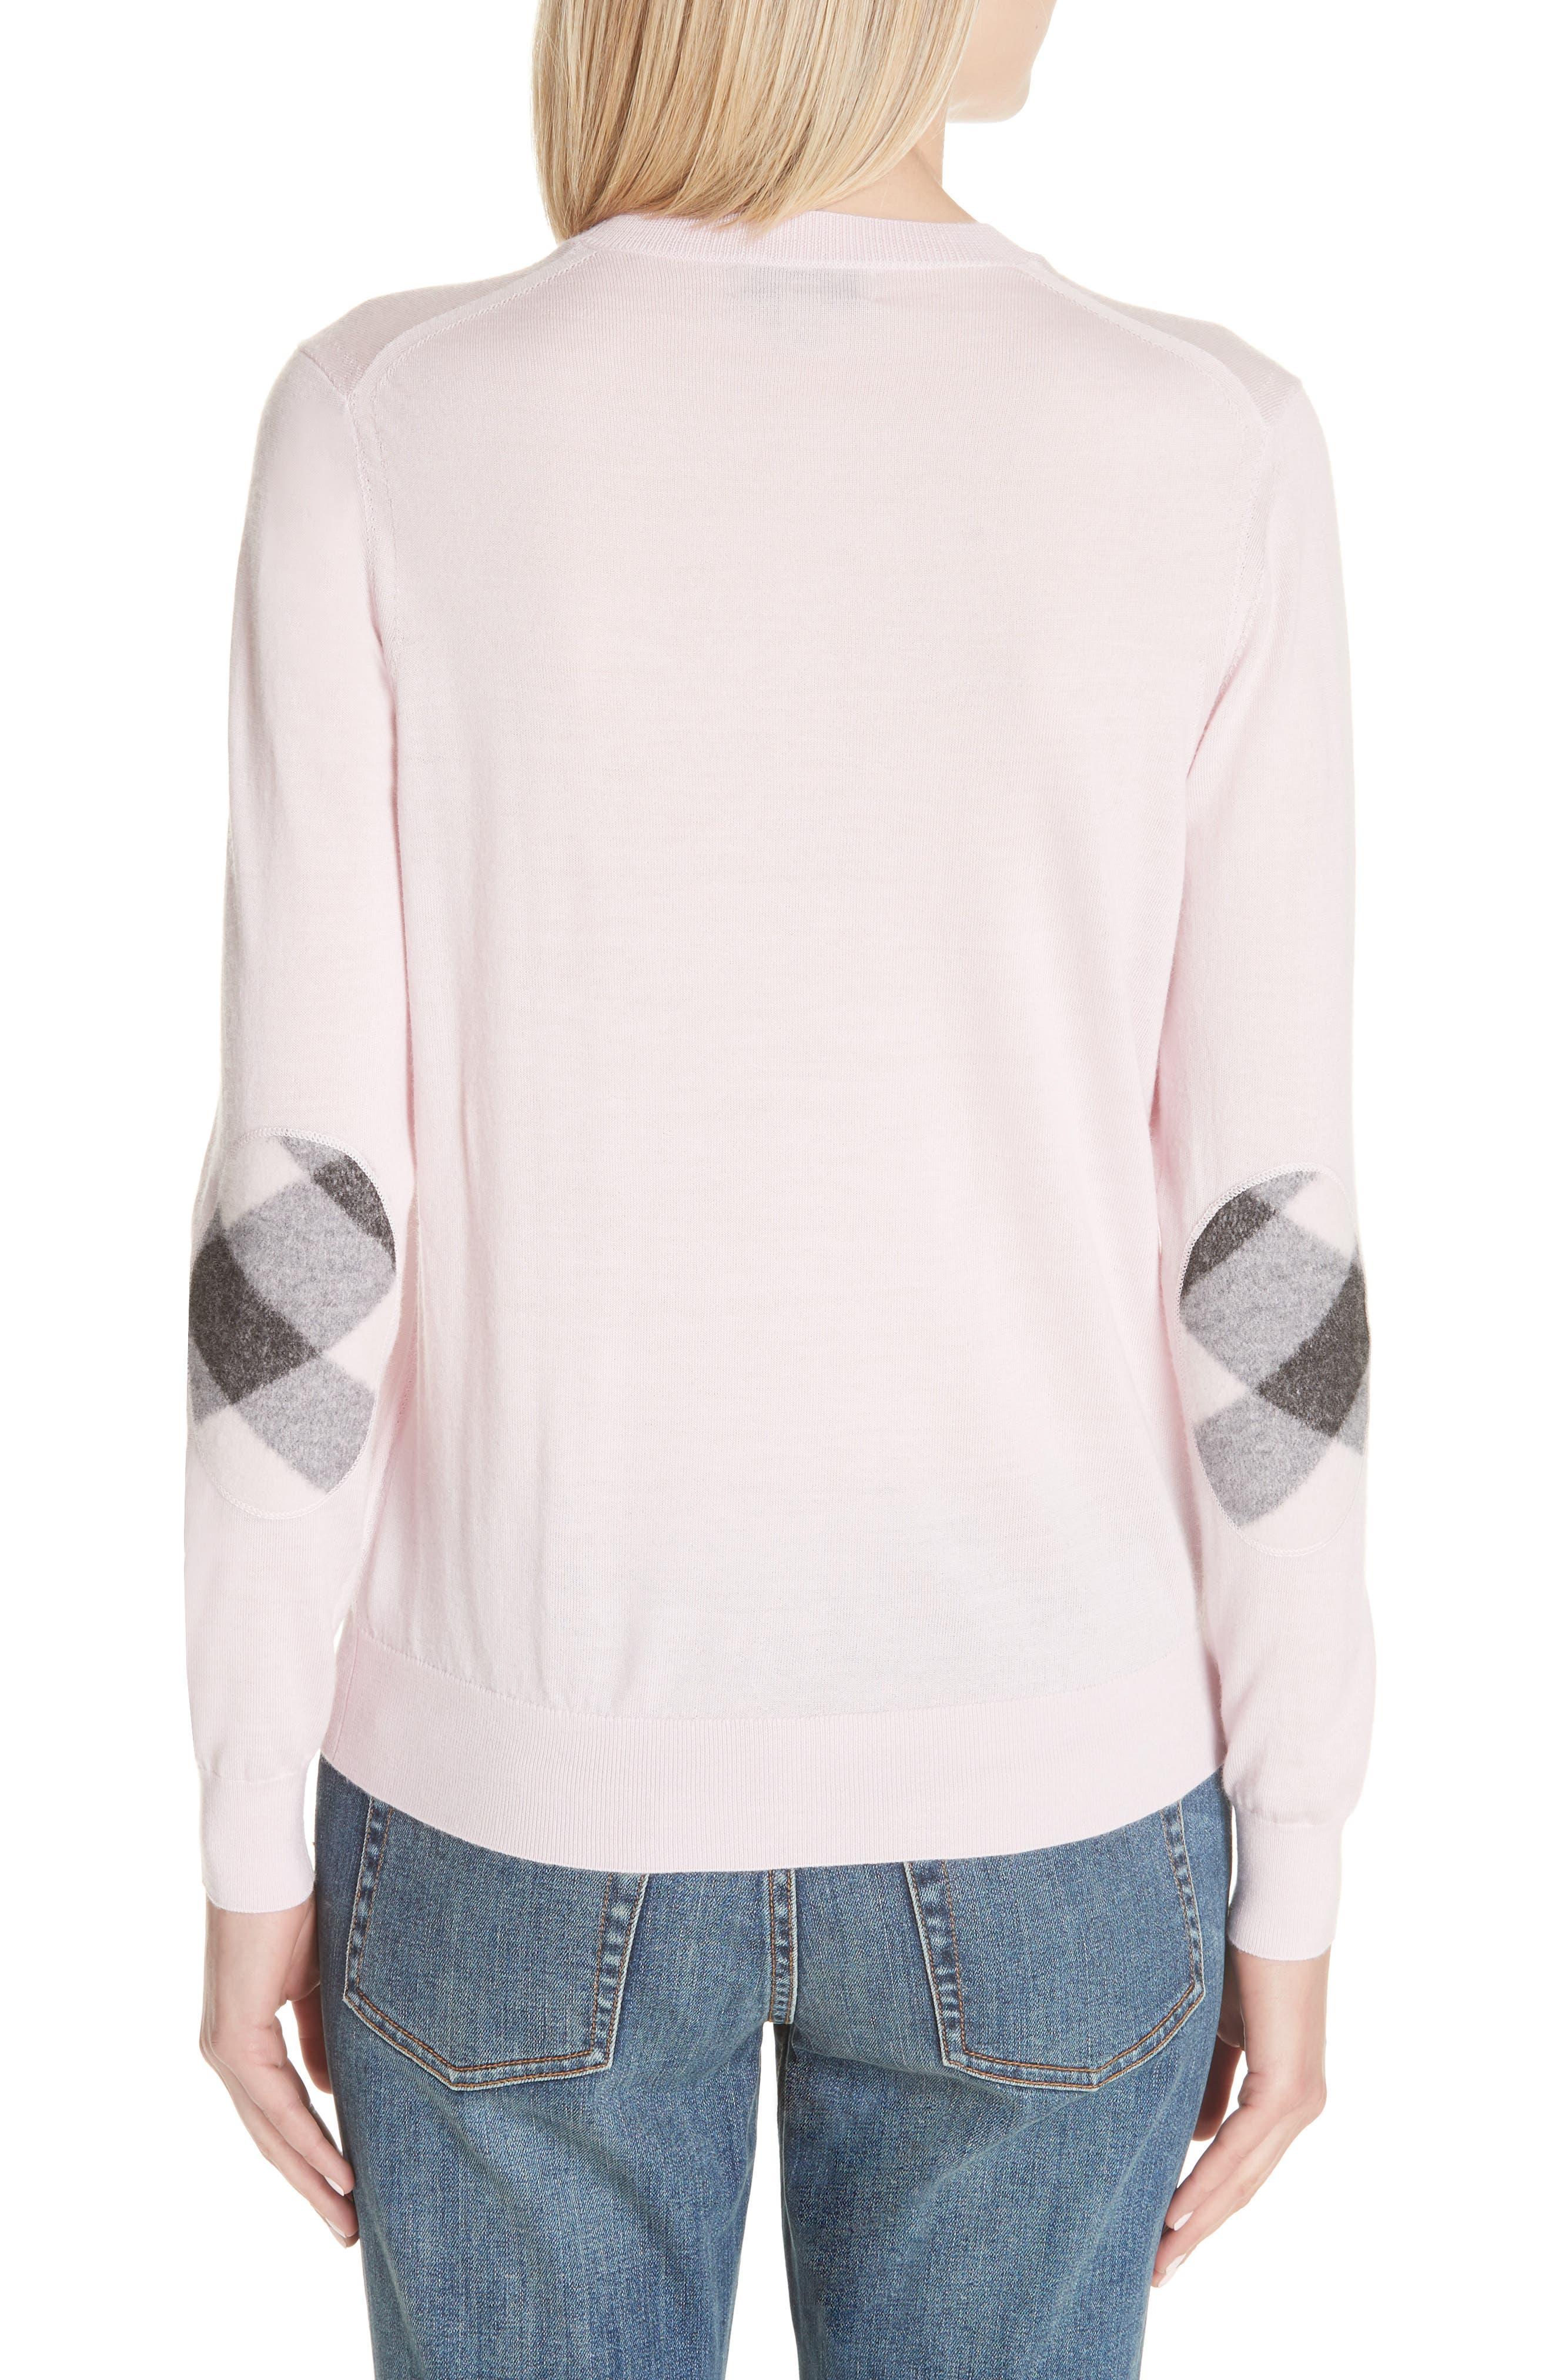 Viar Merino Wool Sweater,                             Alternate thumbnail 2, color,                             Light Pink